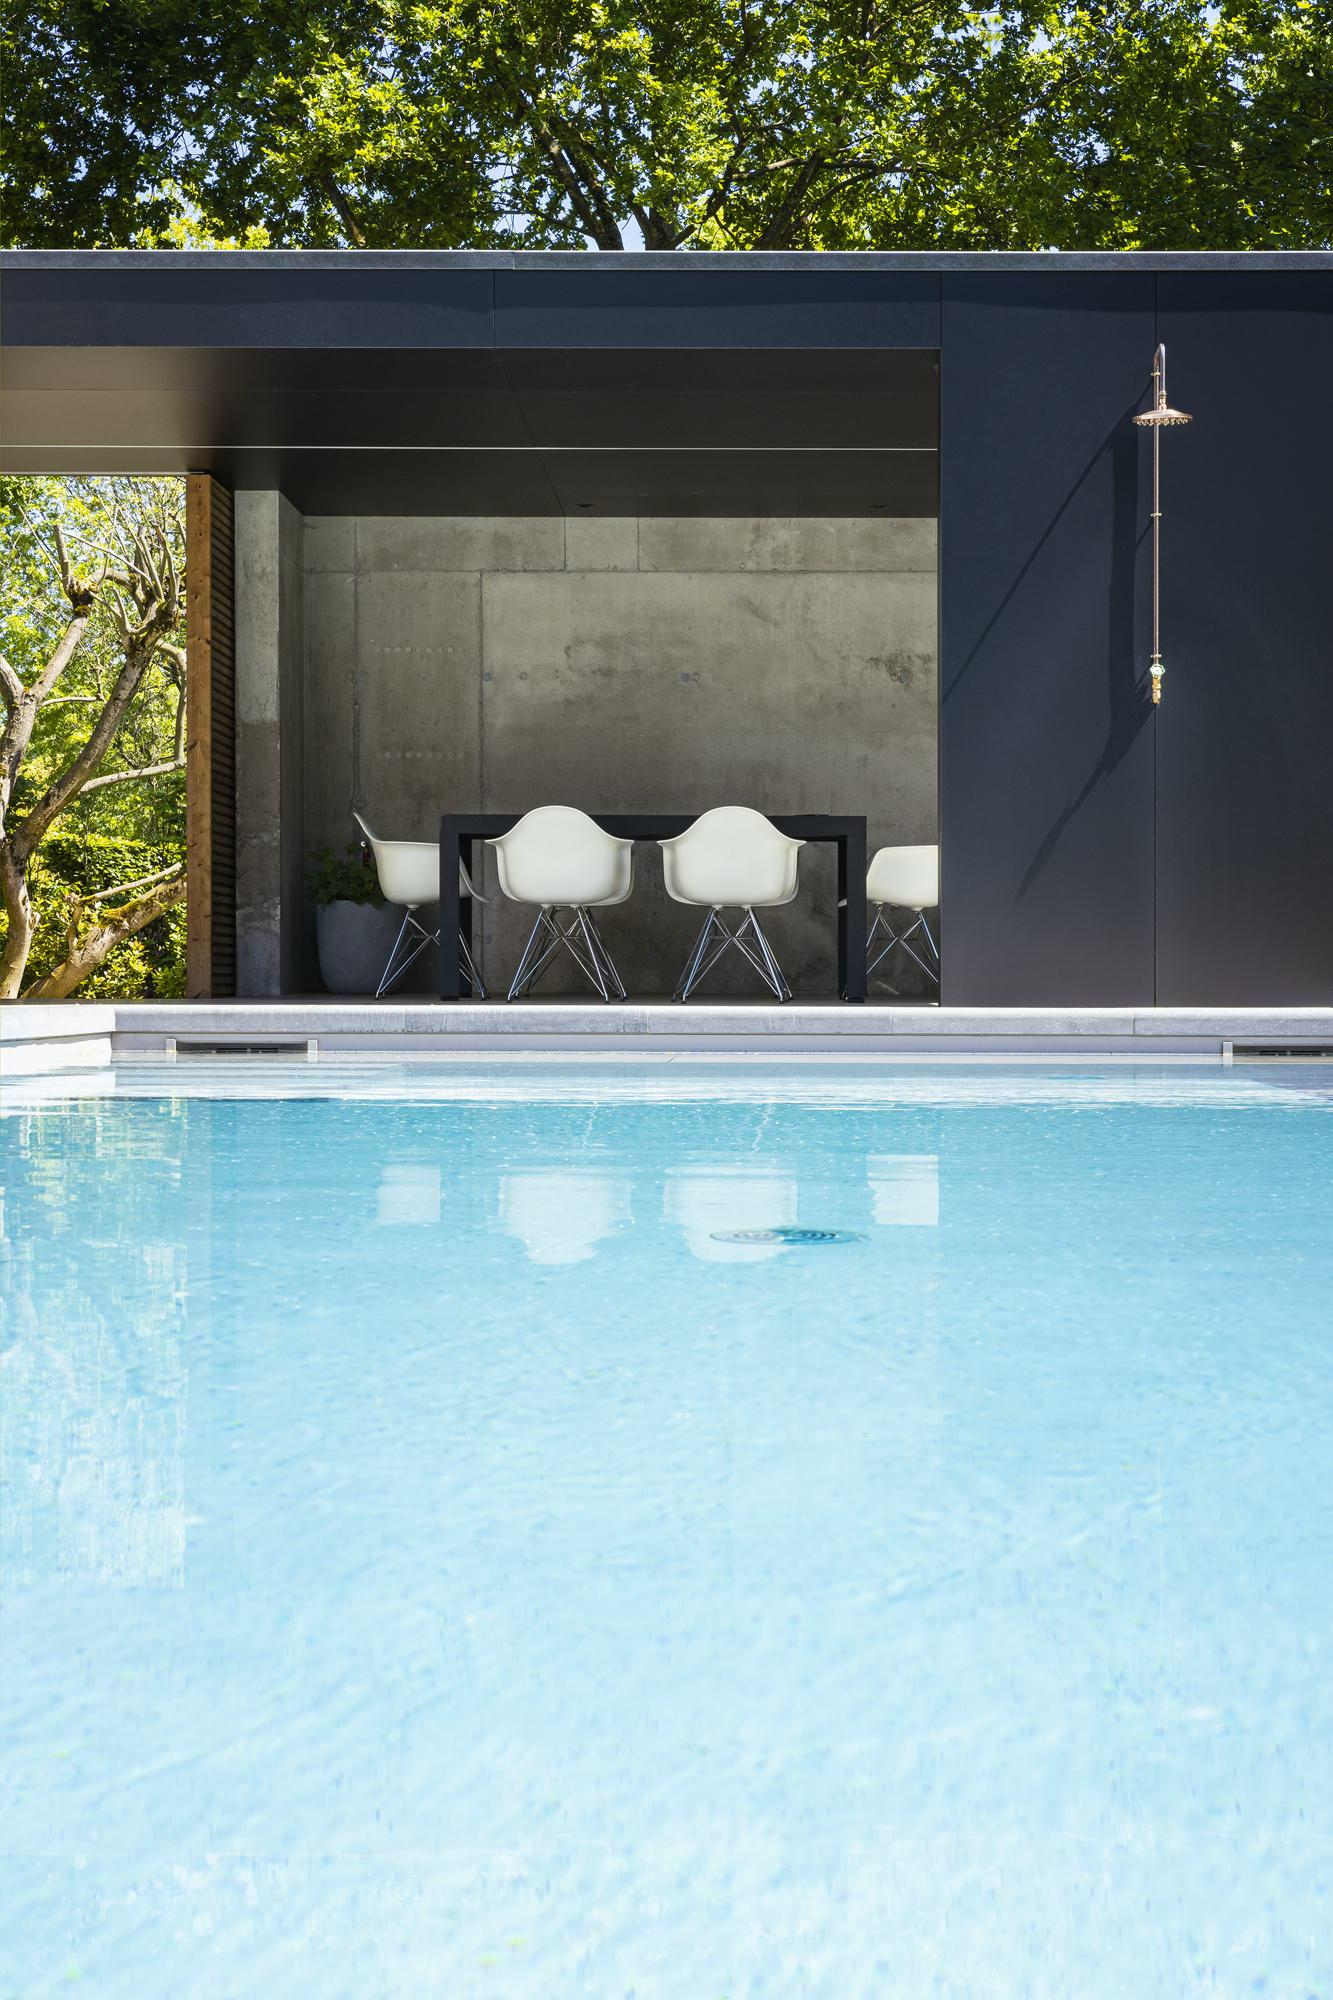 Betonnen zwembad in Sint-Denijs-Westrem